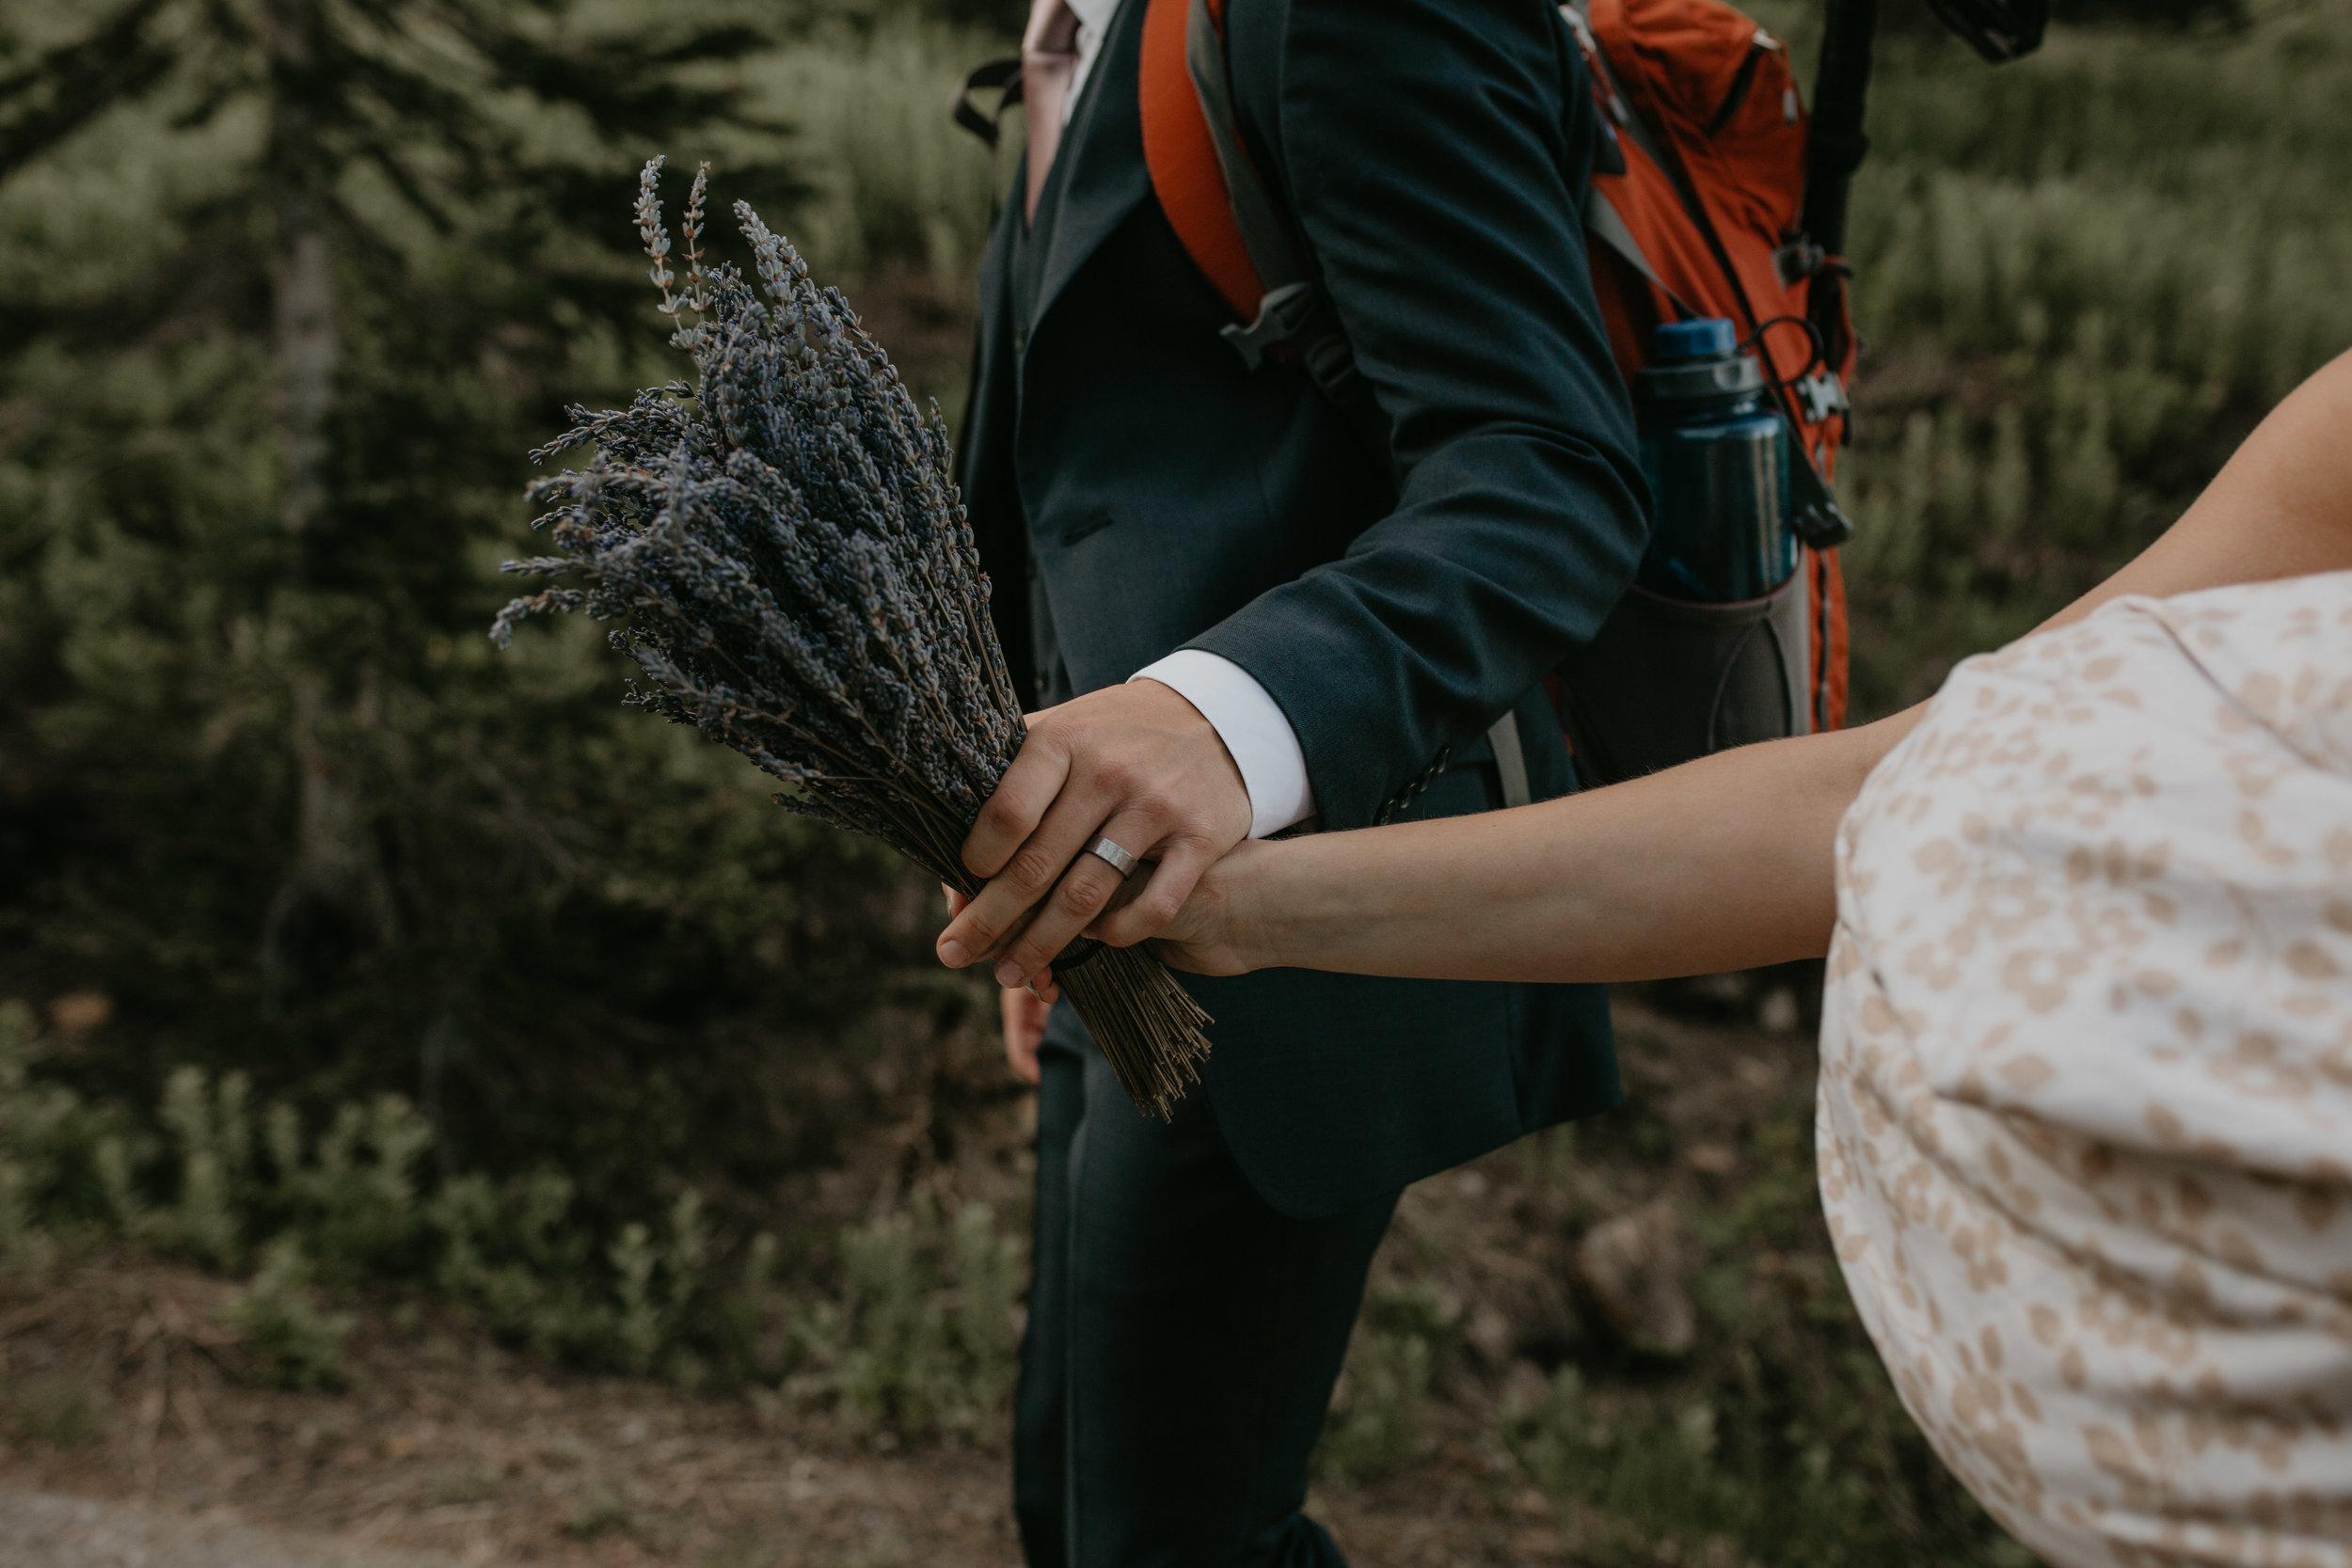 Nicole-Daacke-Photography-Mt-Rainier-elopement-photographer-washington-mountain-epic-wedding-photography-wildflowers-at-rainier-pine-tree-cloudy-summer-day-at-mountain-rainier-36.jpg